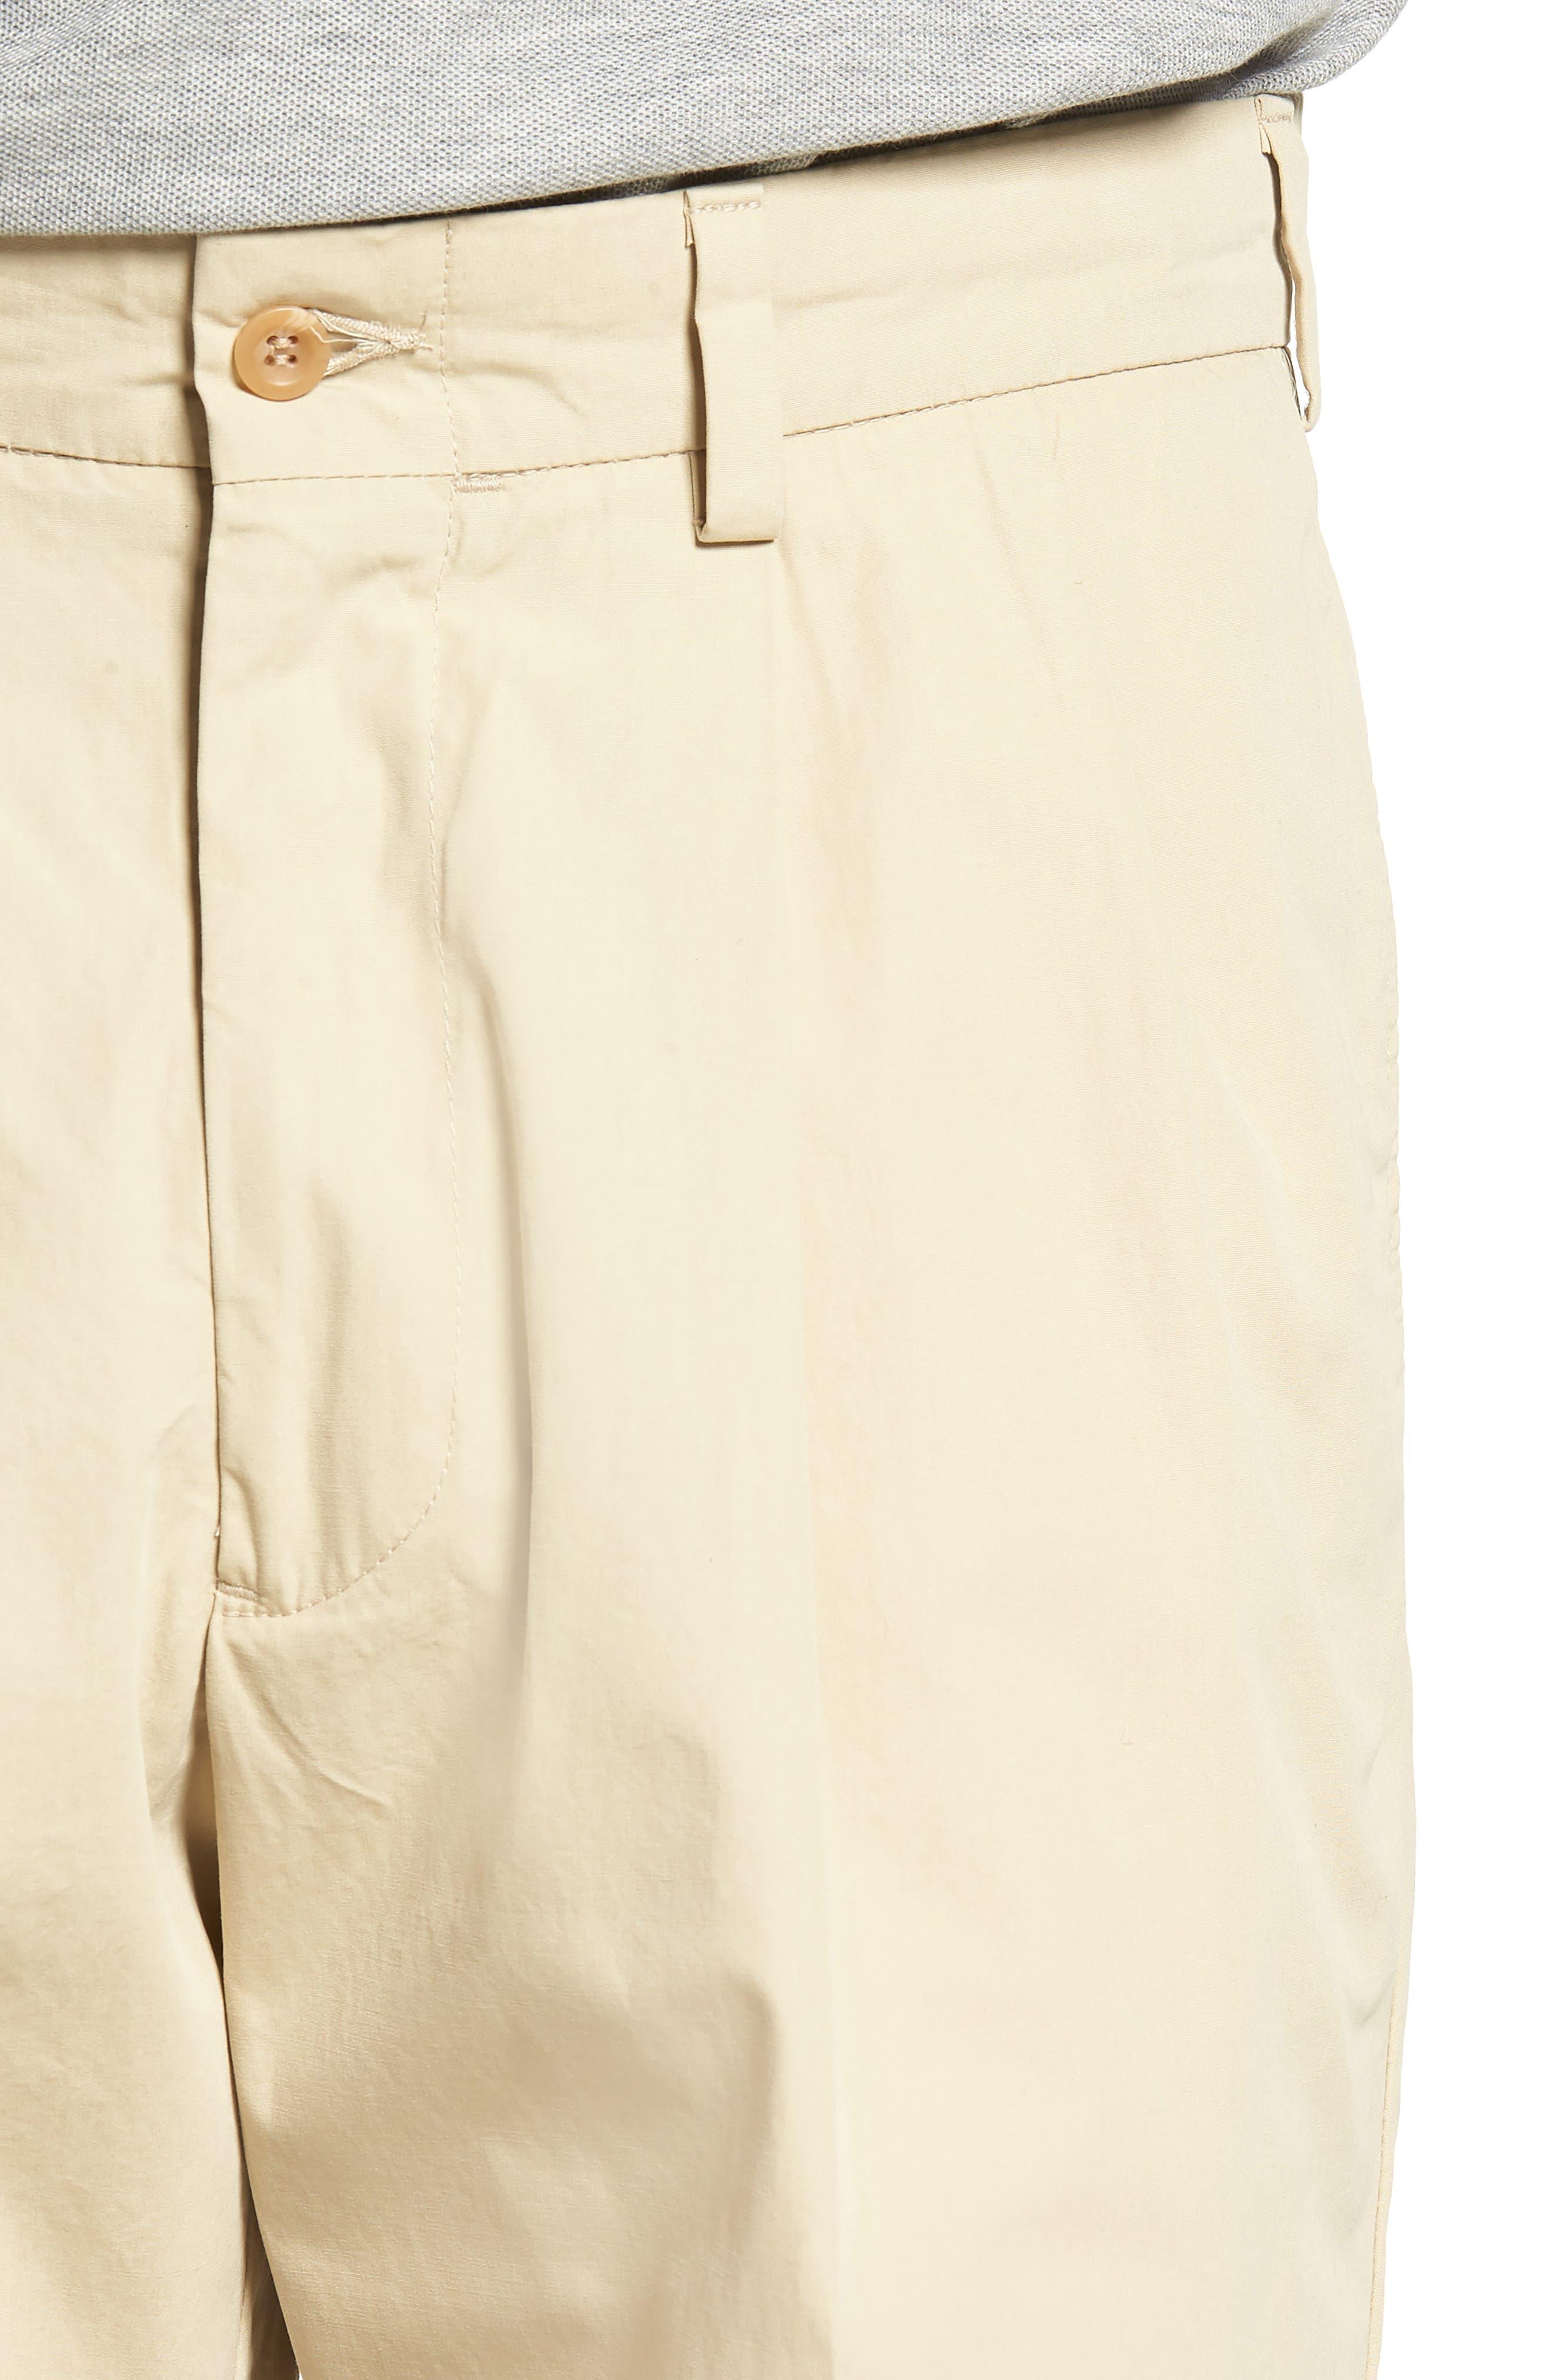 M2 Classic Fit Pleated Tropical Cotton Poplin Shorts,                             Alternate thumbnail 4, color,                             Khaki